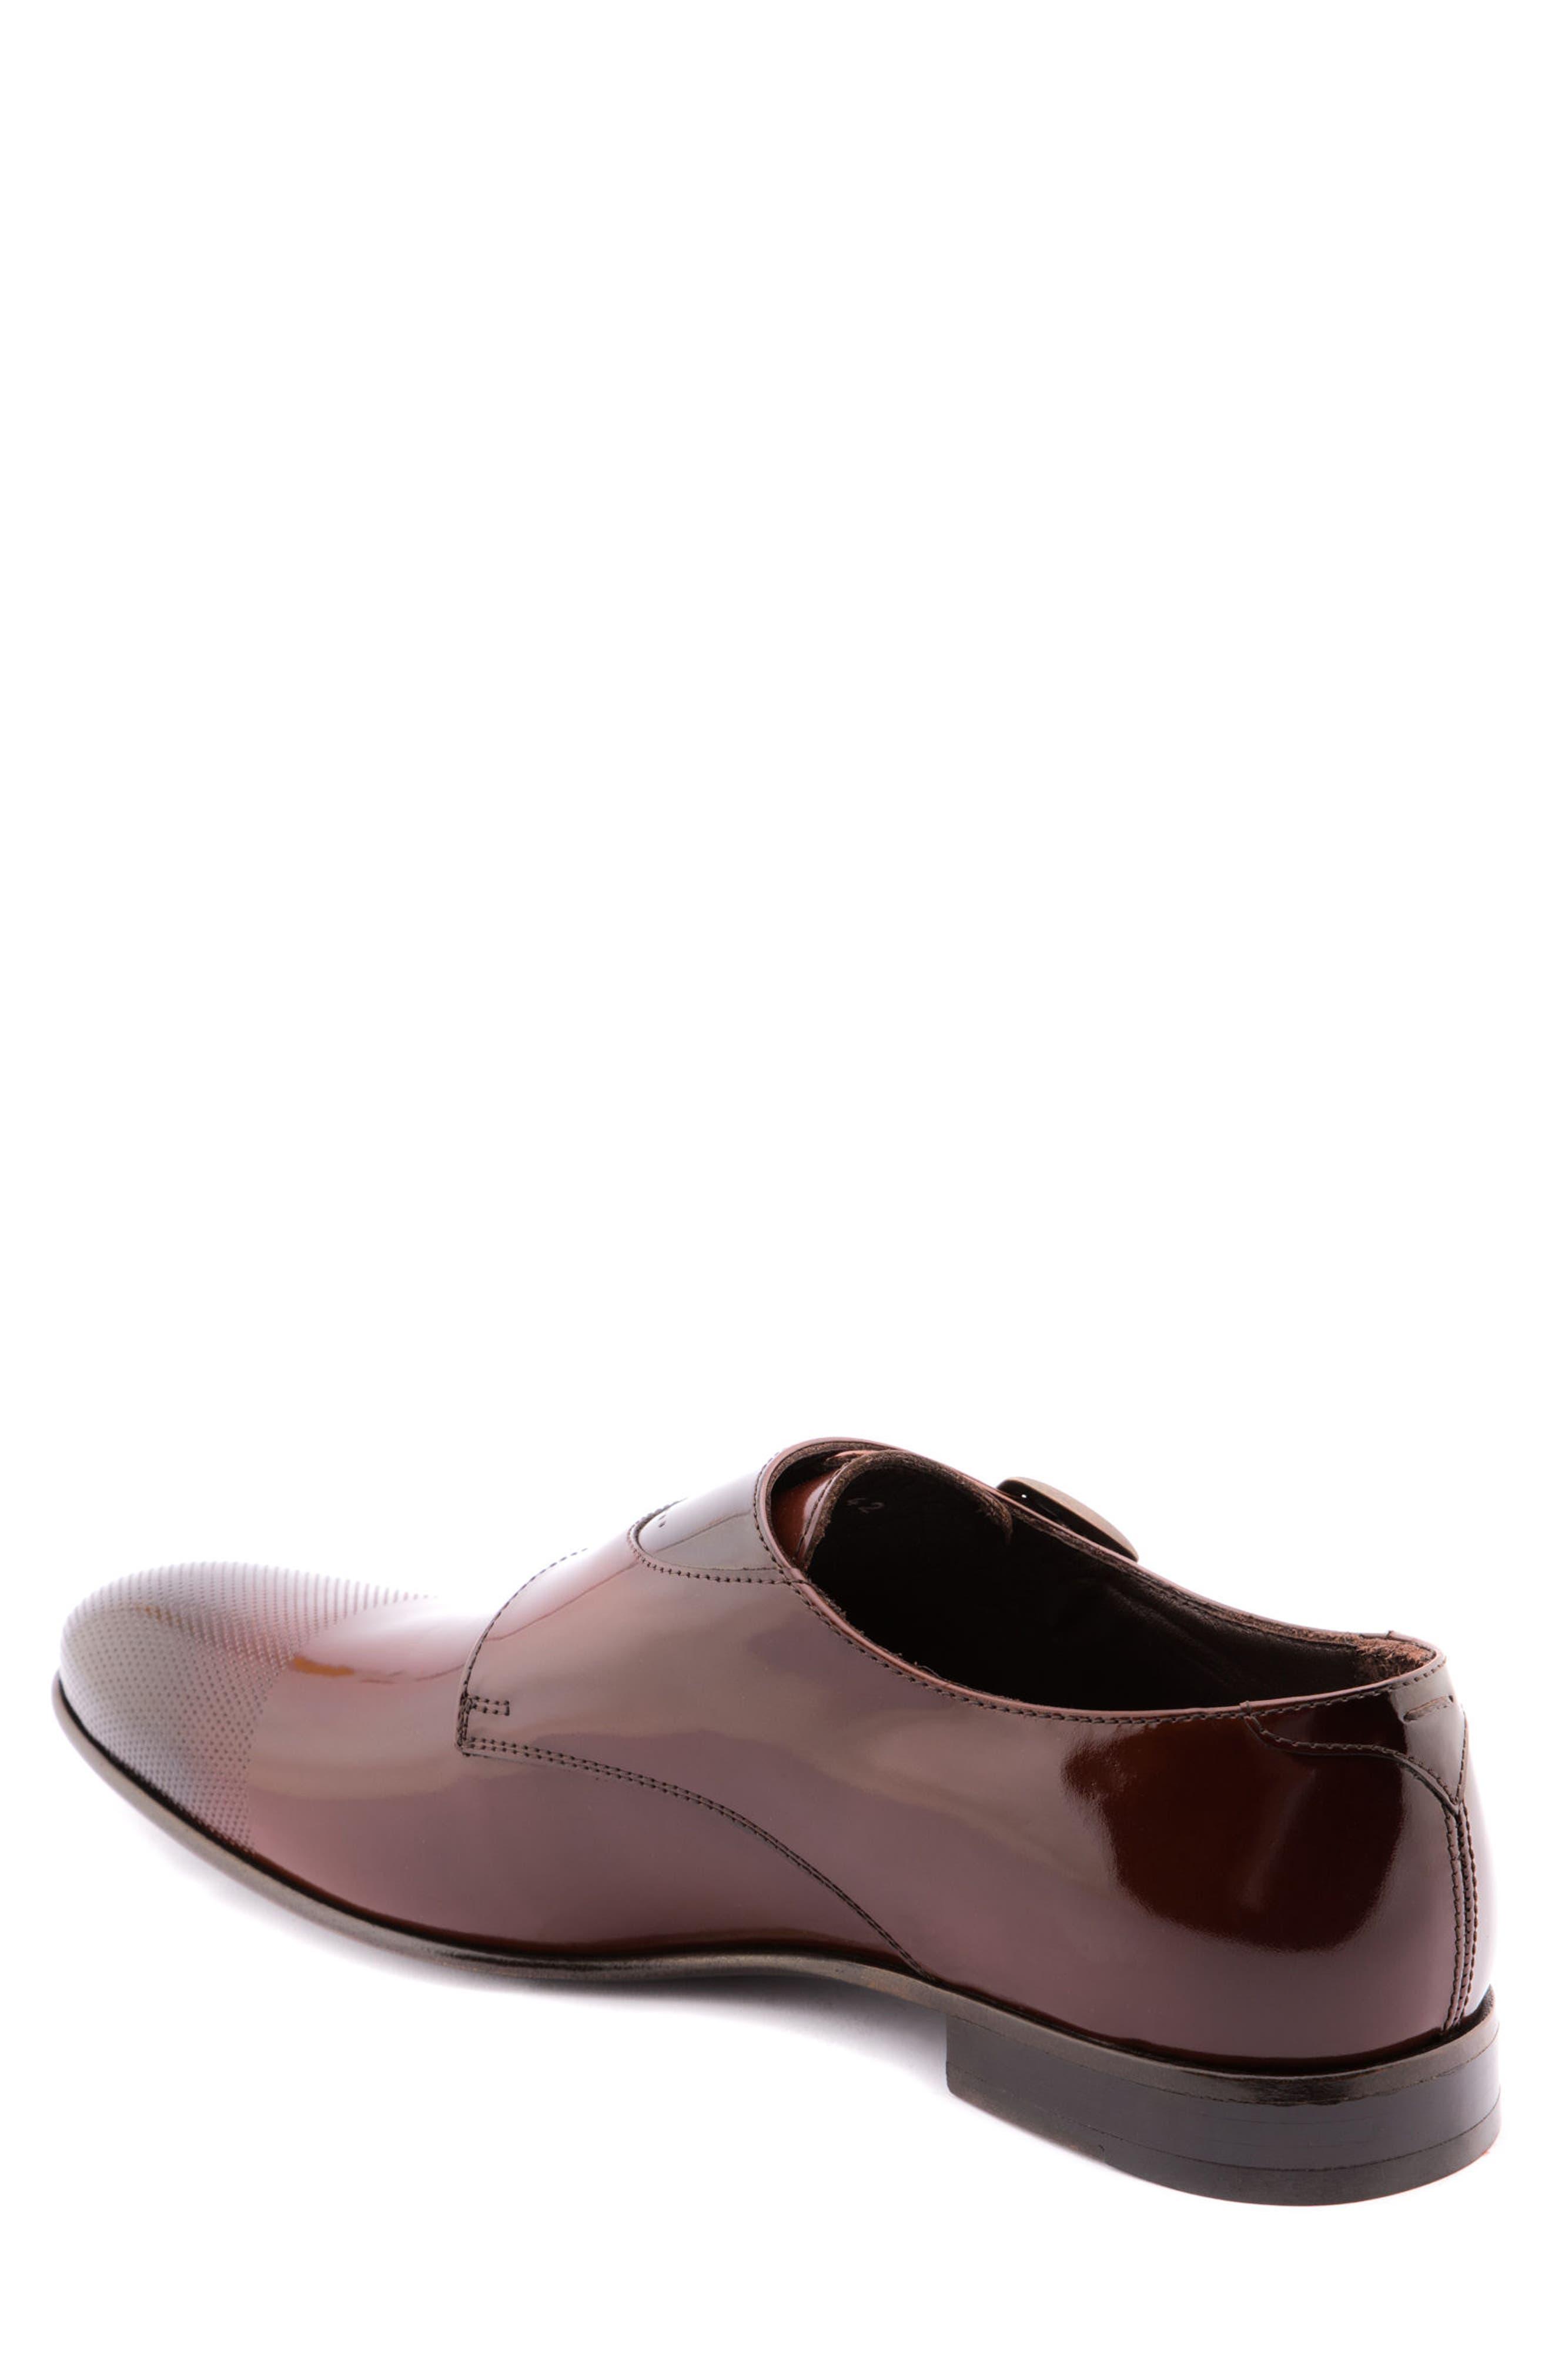 Martin Double Monk Strap Shoe,                             Alternate thumbnail 2, color,                             Brown